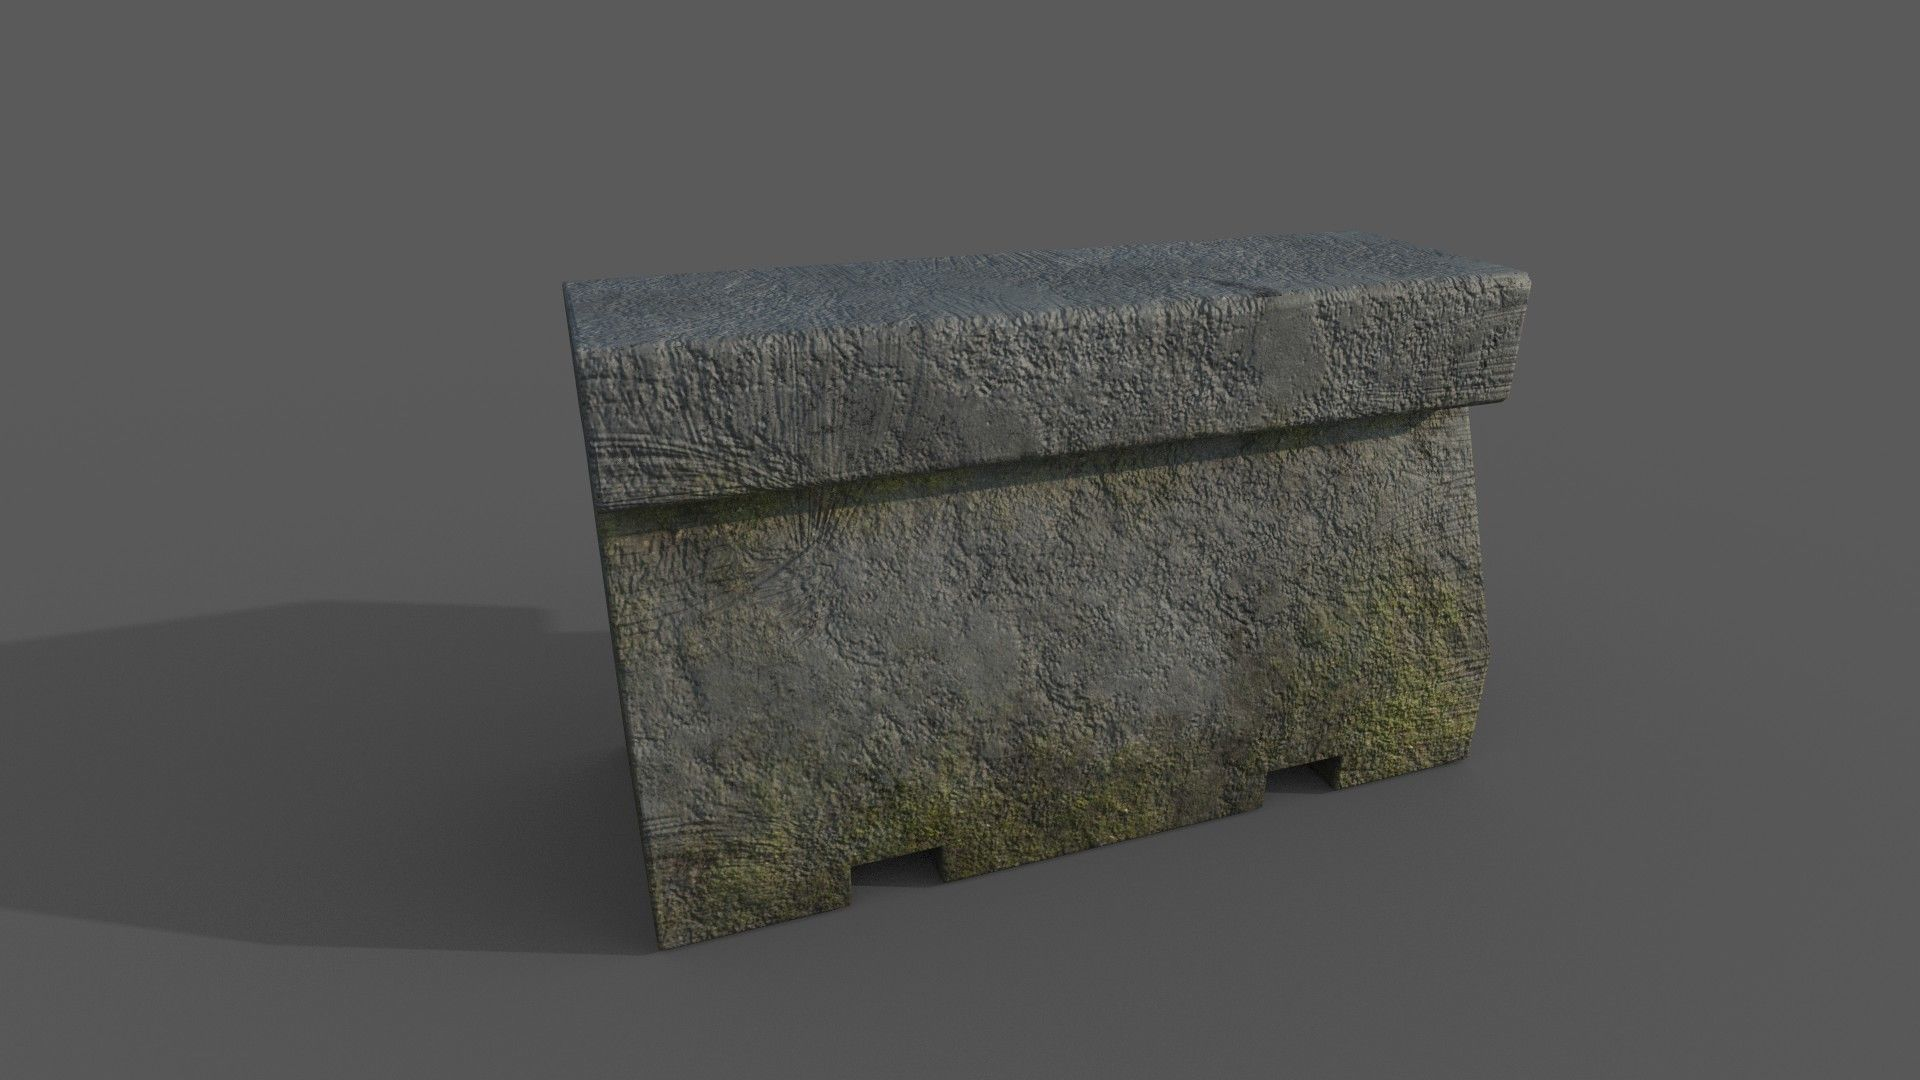 Concrete Barrier Type 11